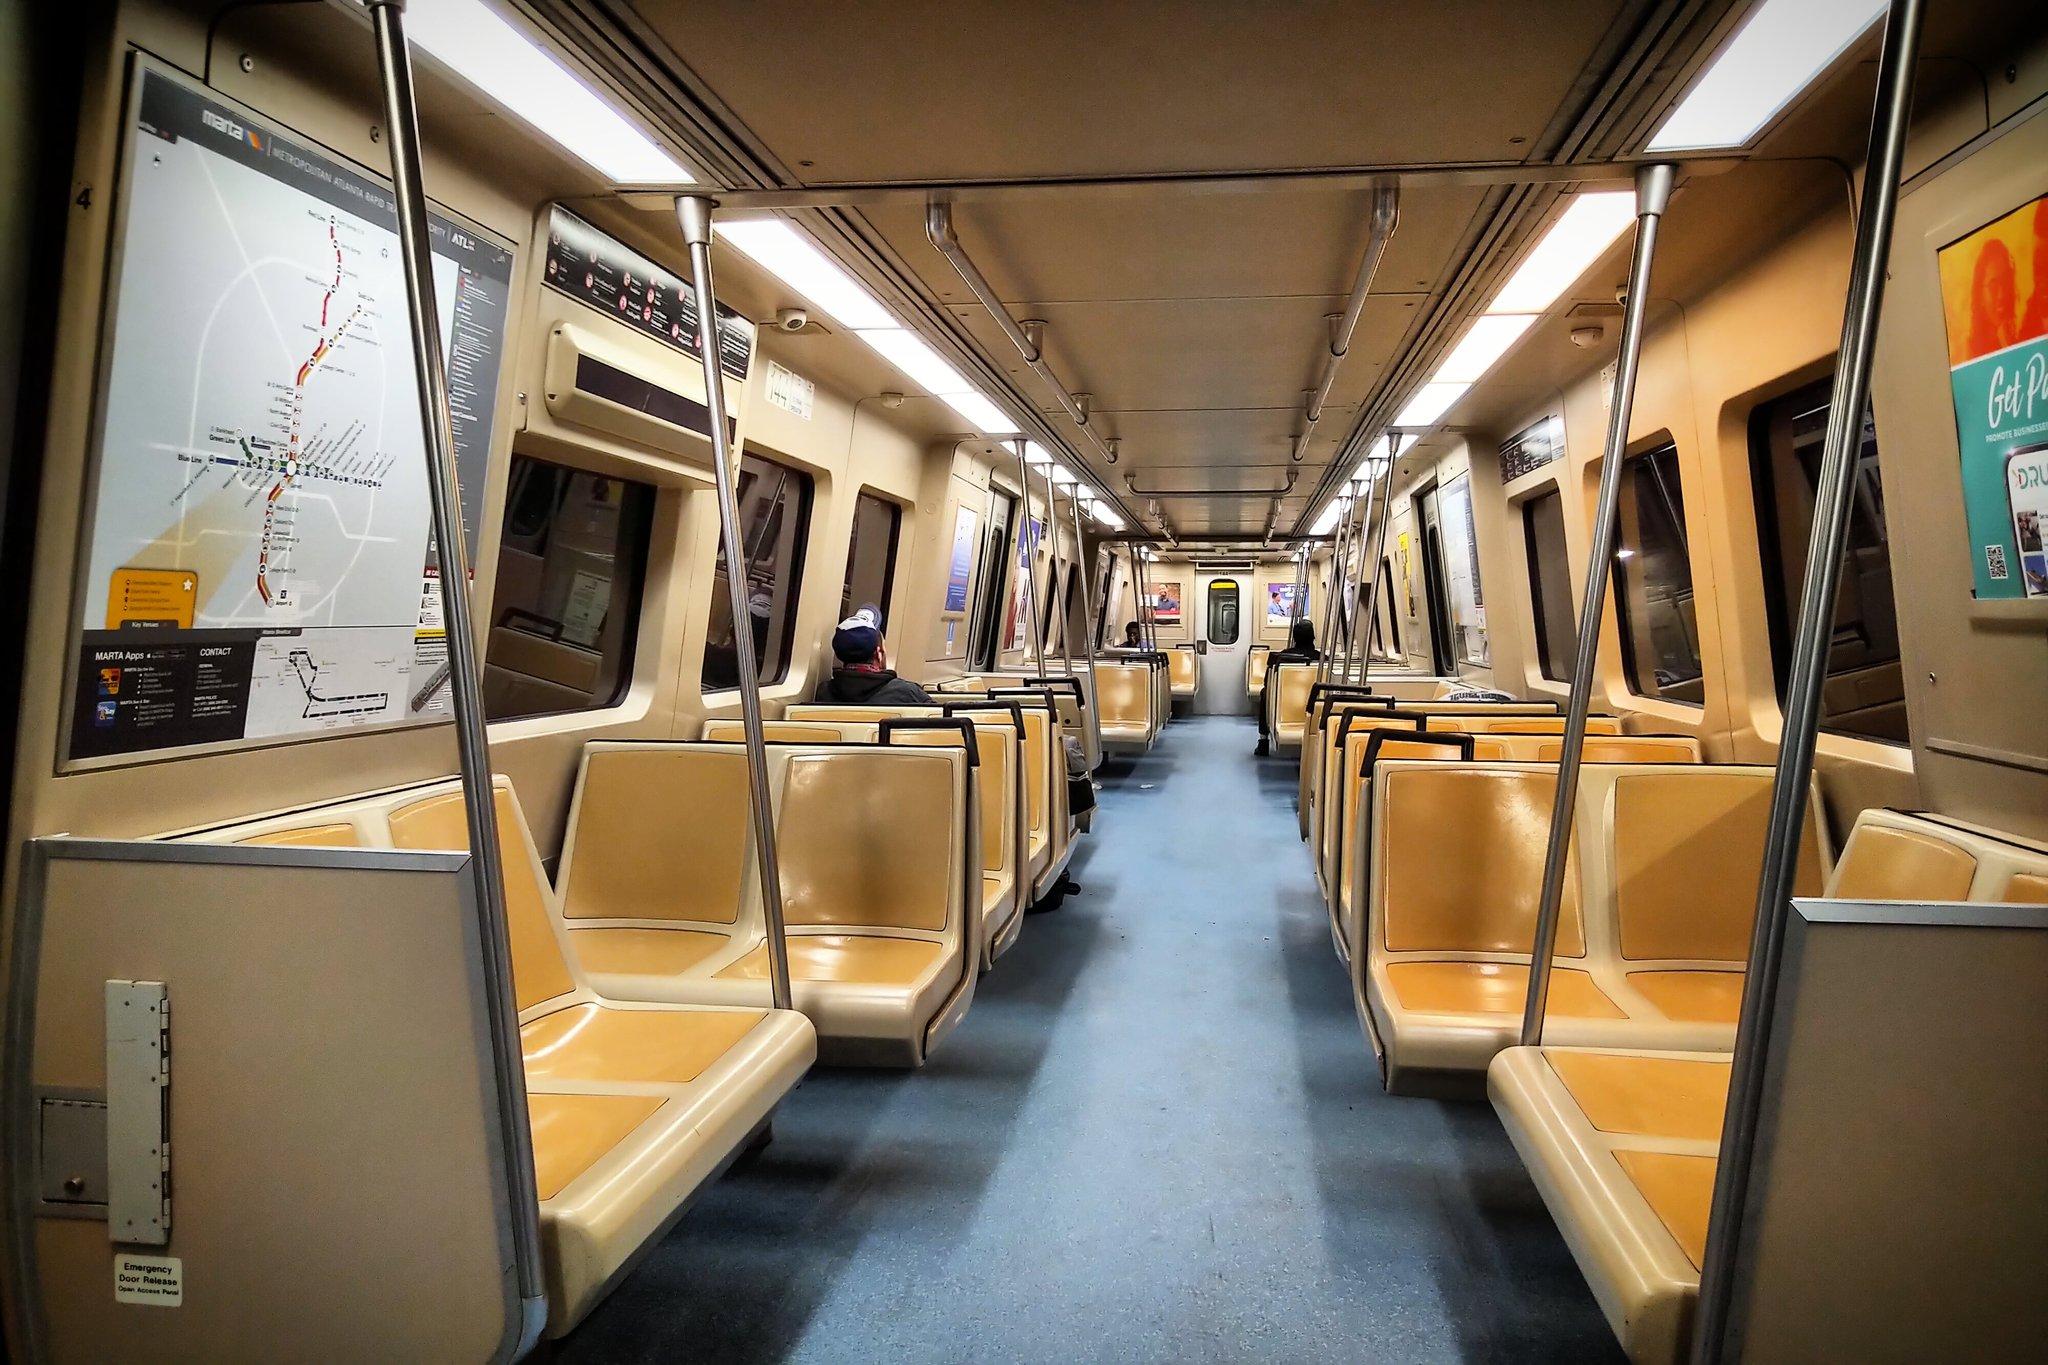 A nearly empty MARTA train car.